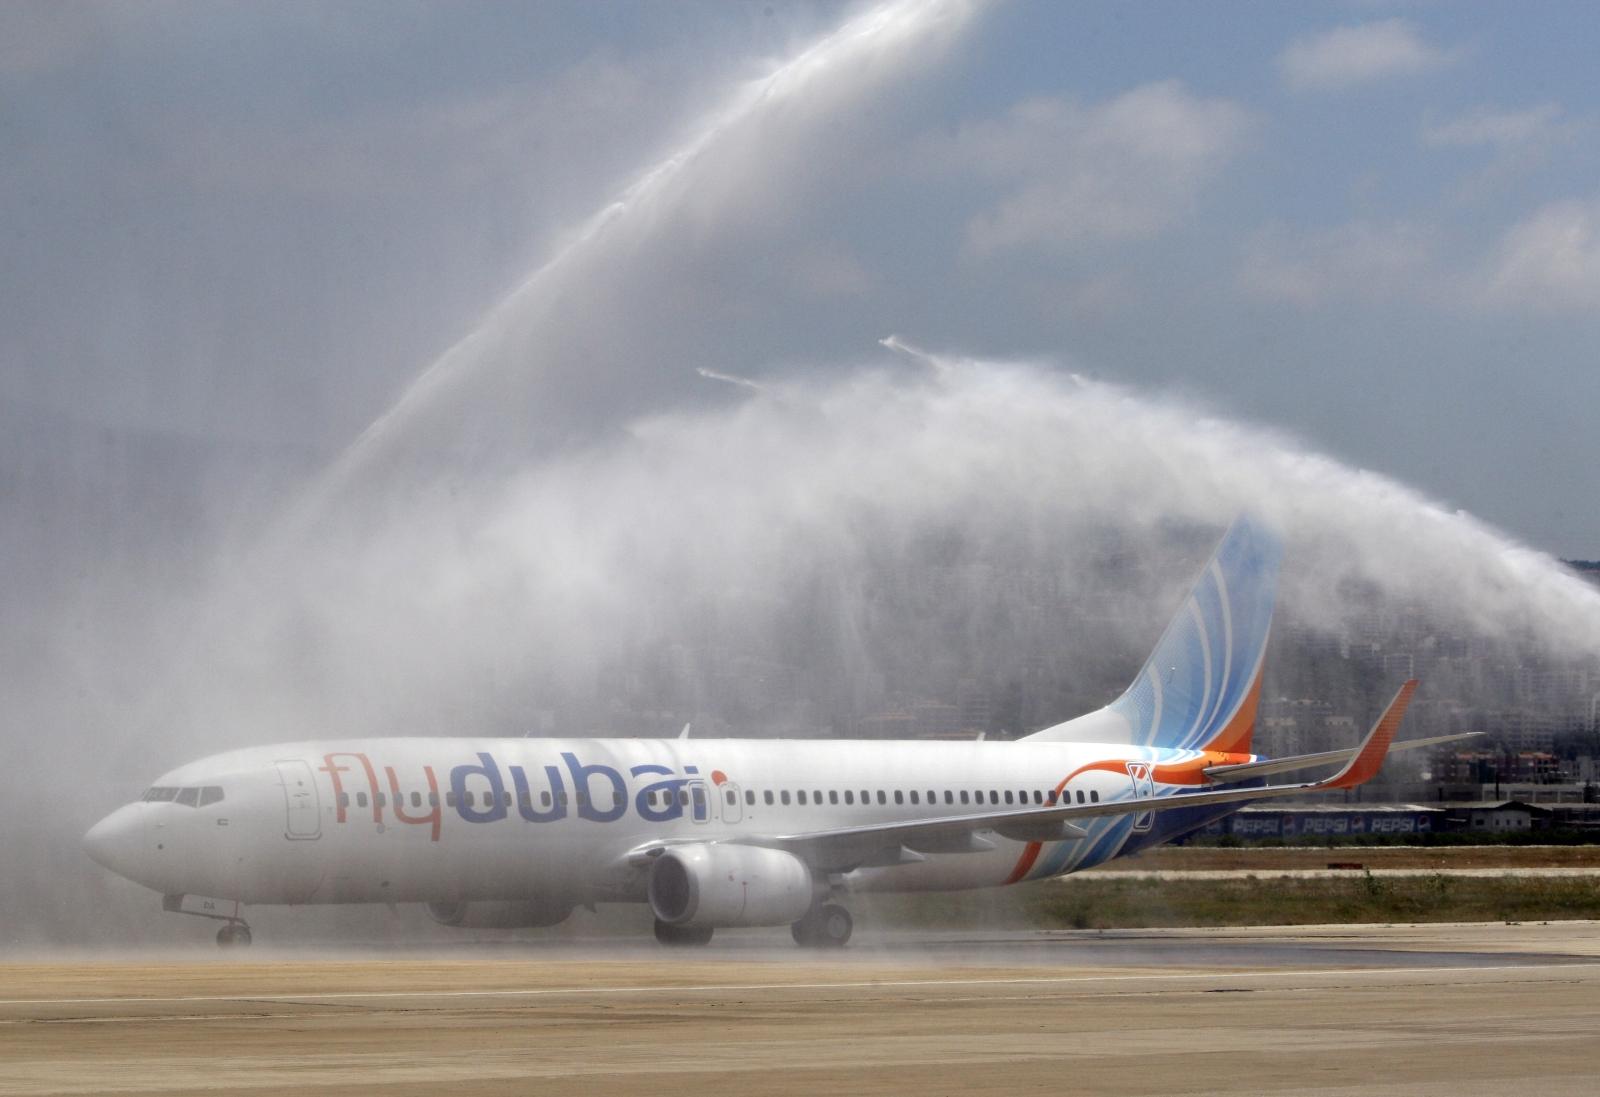 Passenger plane shot at in Baghdad airport